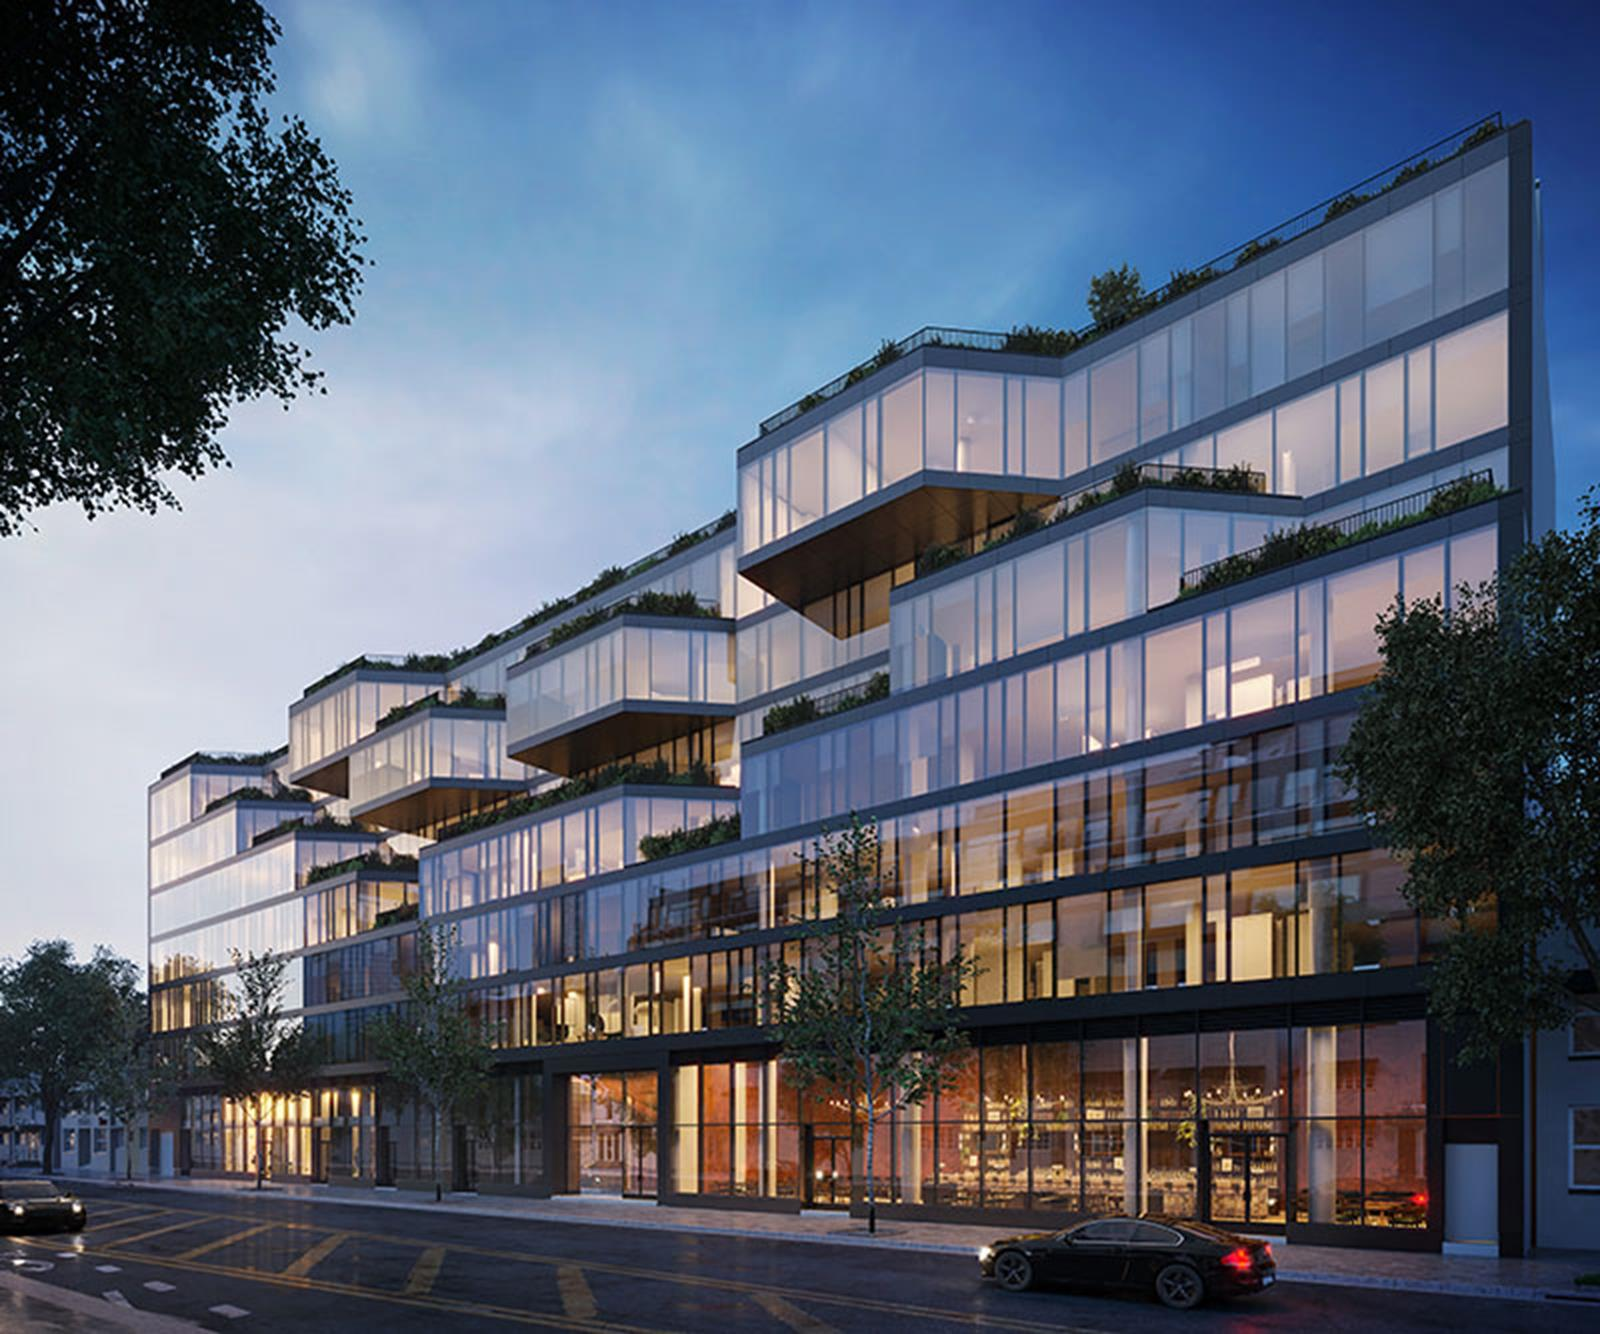 Long Island City Ny: Long Island City Luxusimmobilien Und Immobilien Zum